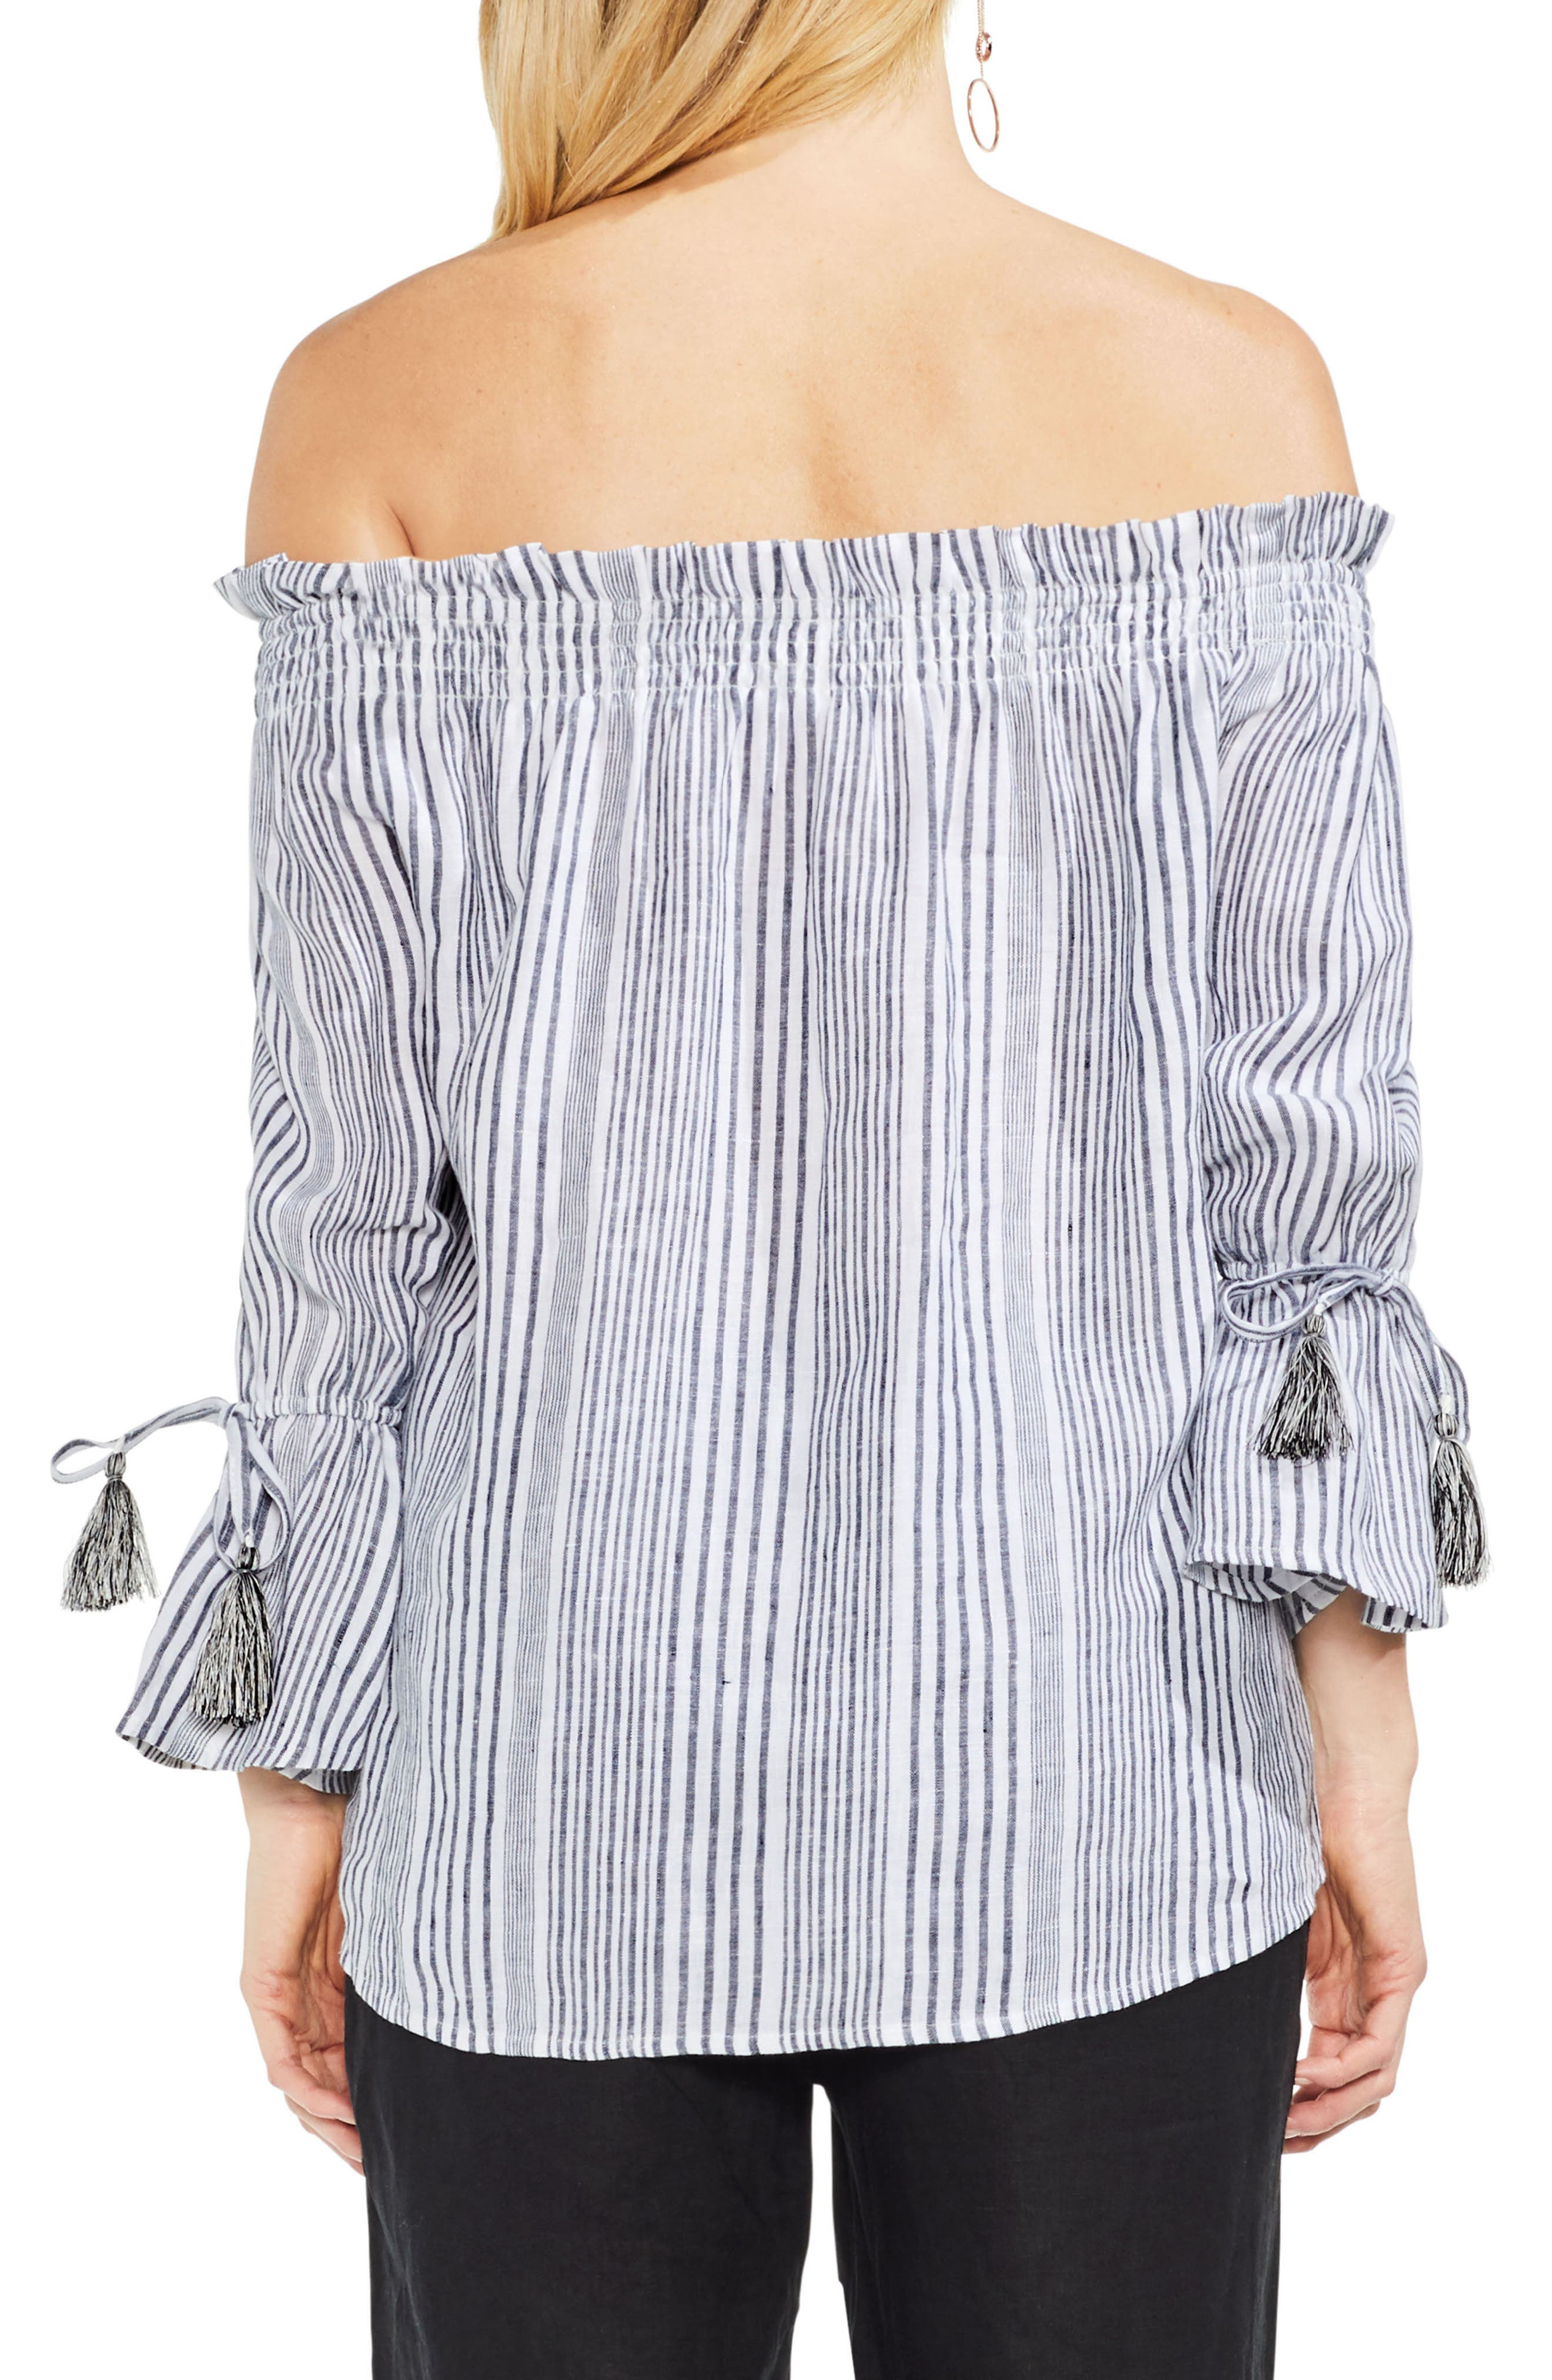 Linen Stripe Statement Sleeve Top,                             Alternate thumbnail 2, color,                             001